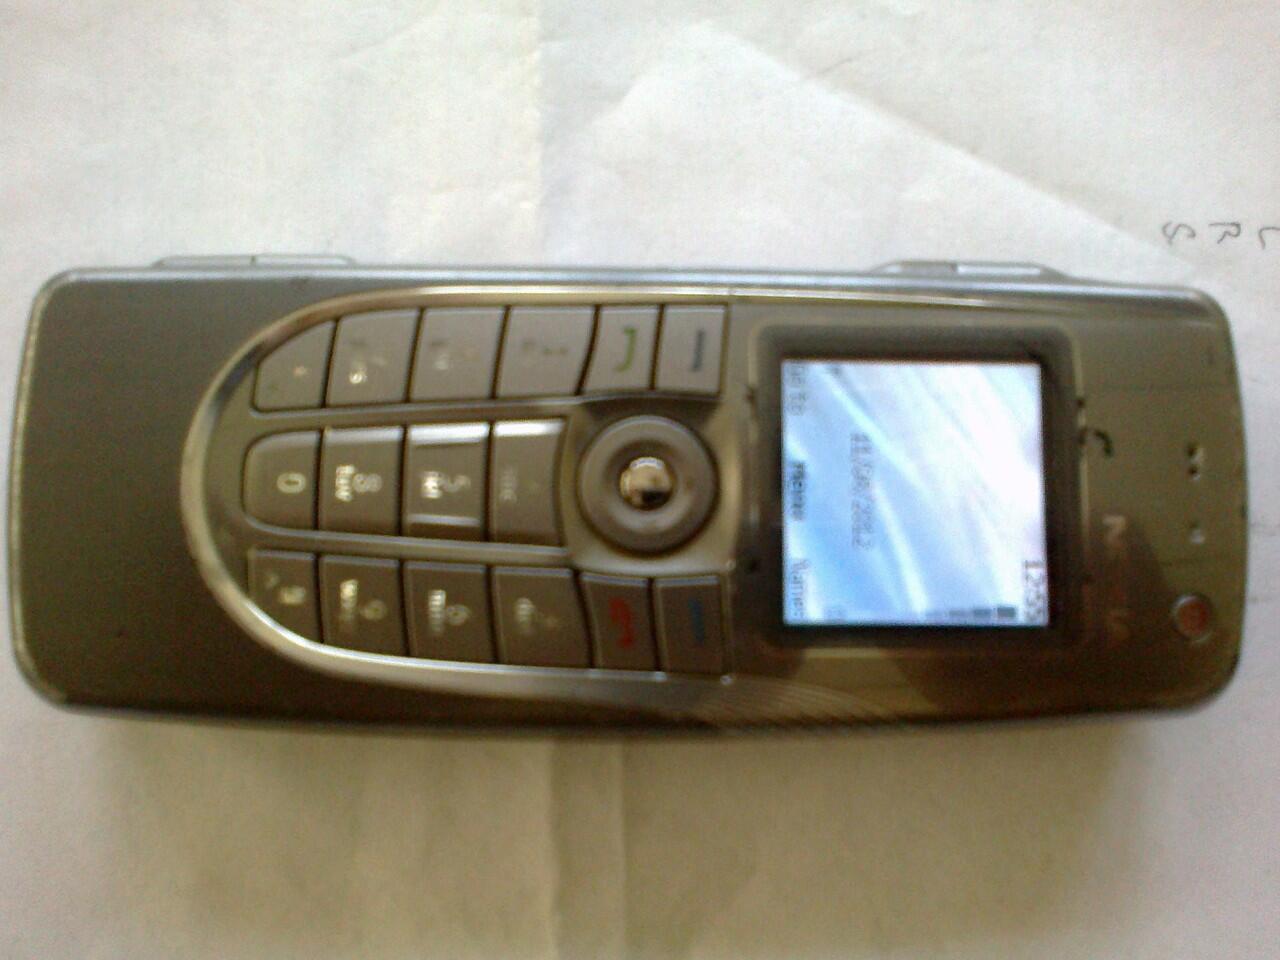 wts Nokia Communicator 9300i wifi